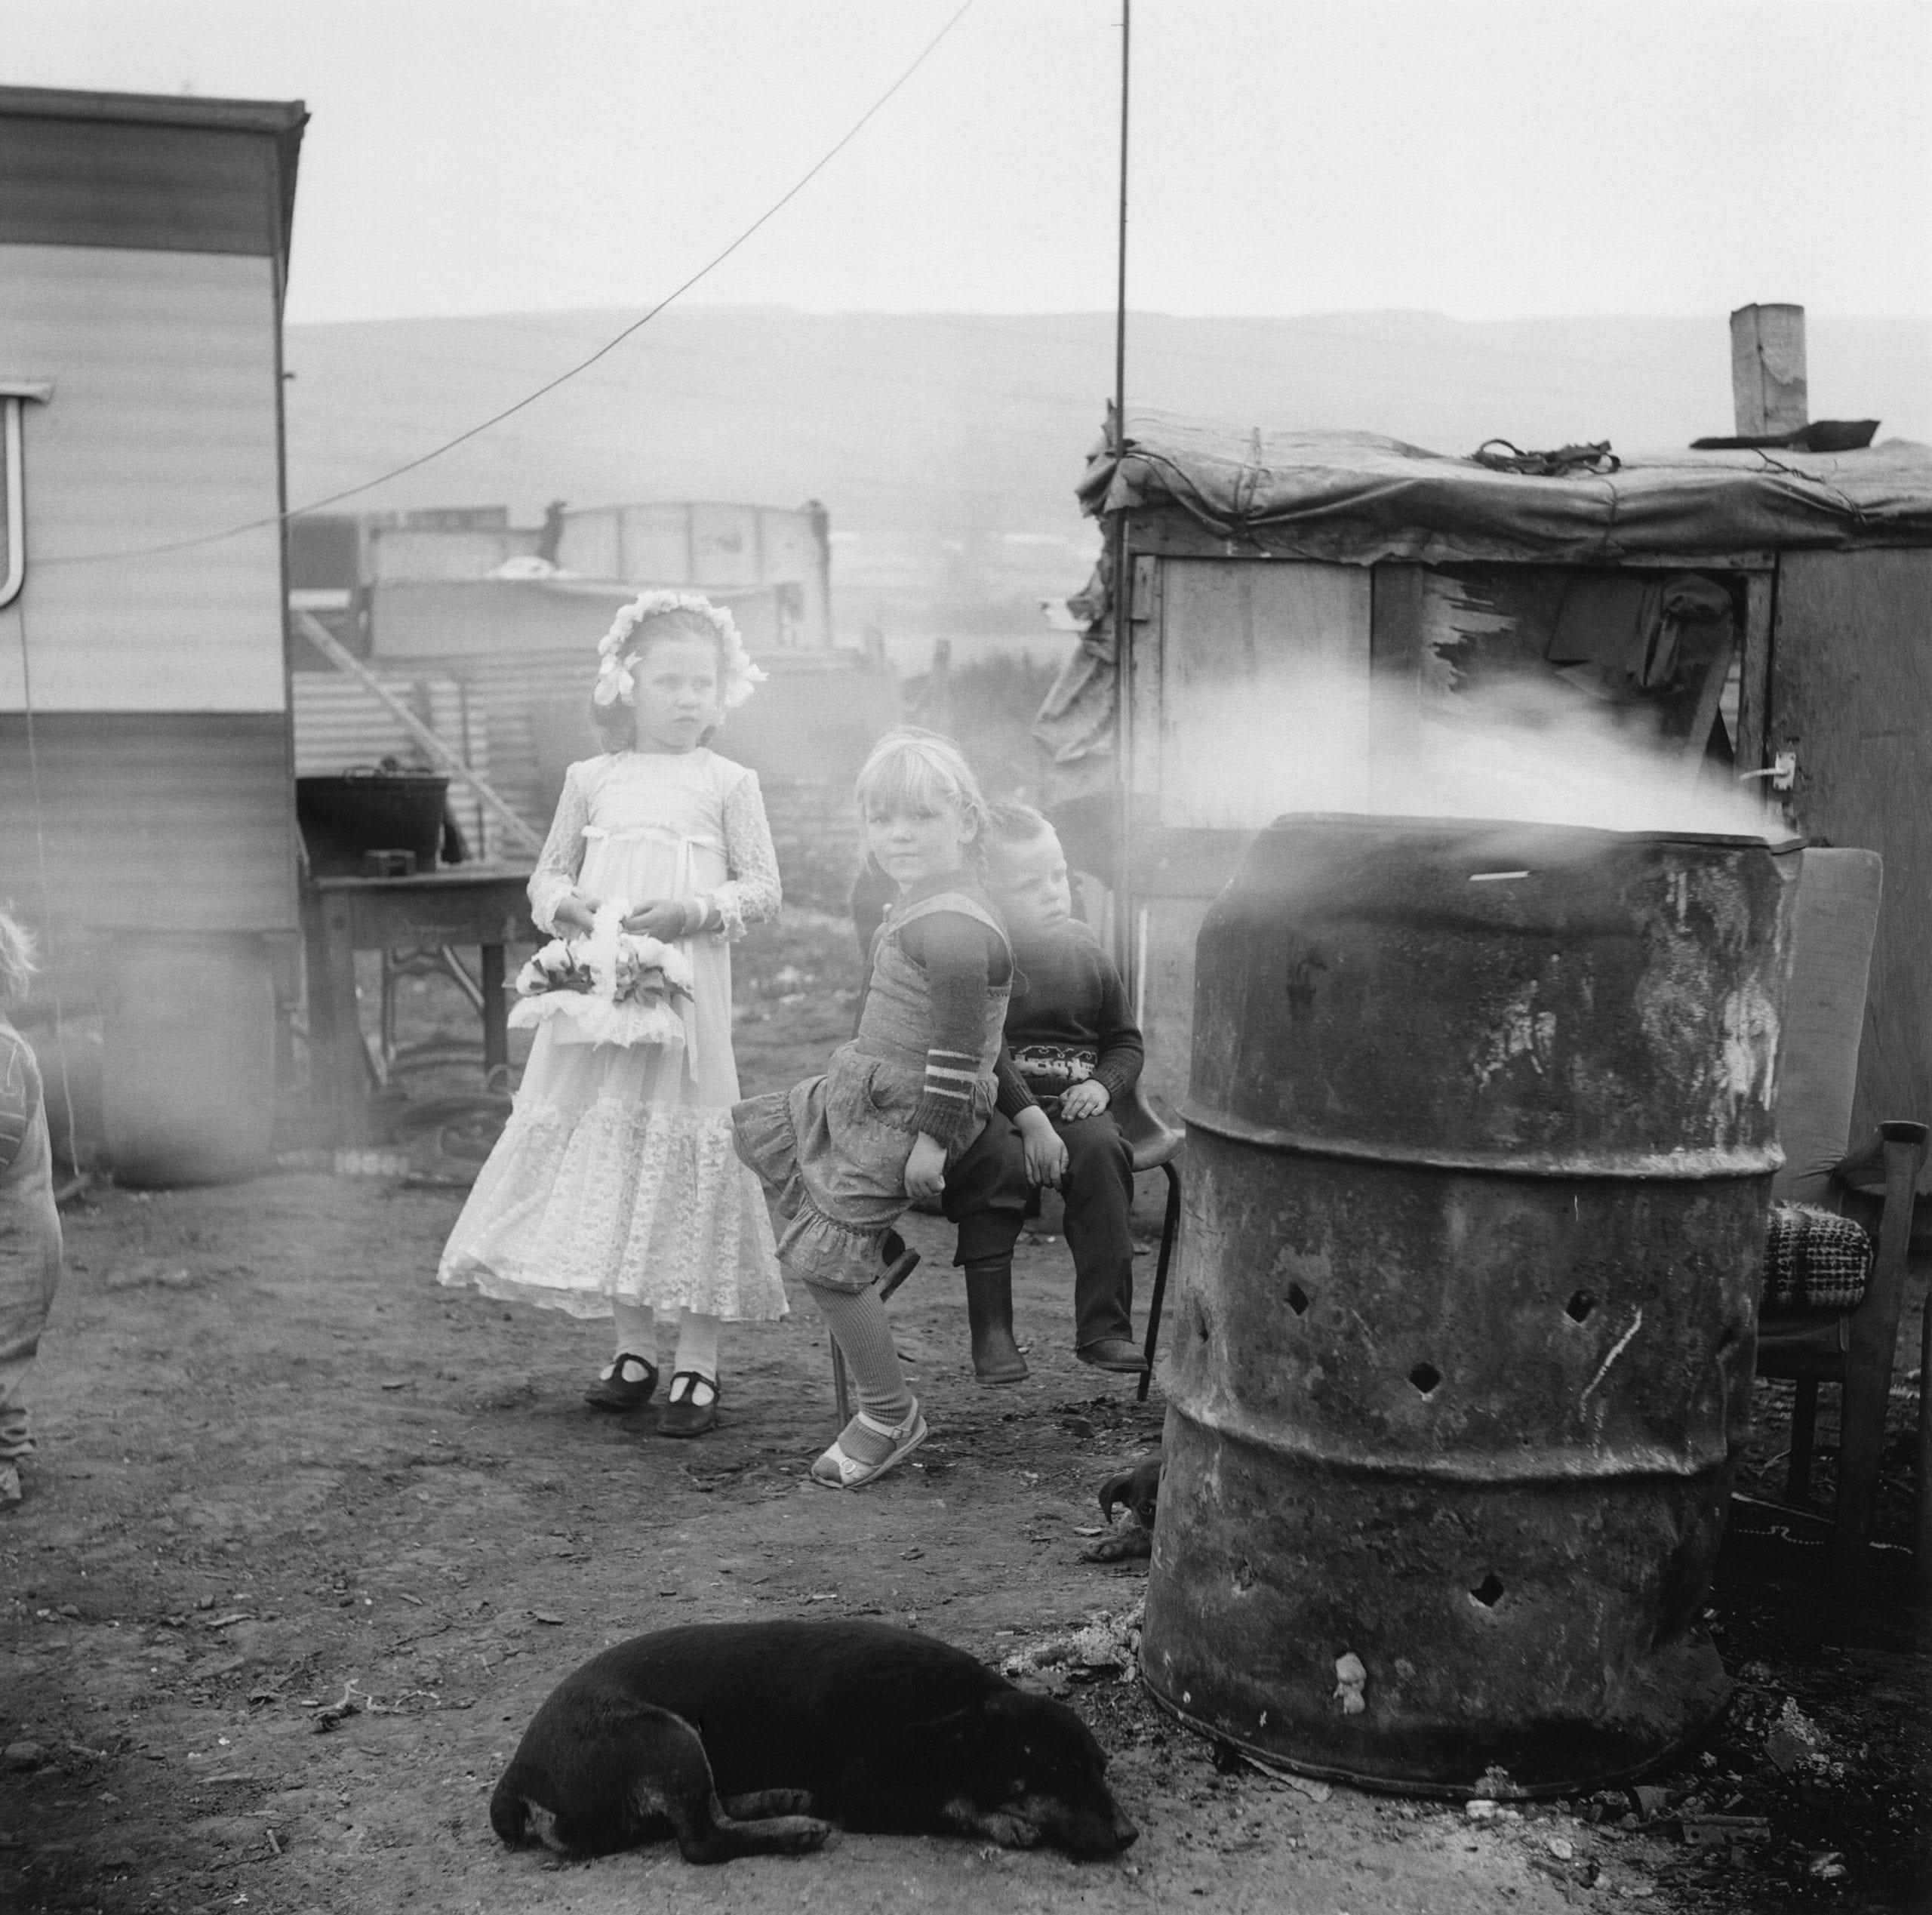 GB. Northern Ireland. Belfast. Gypsy bridesmaid on her sisters wedding day. 1986.